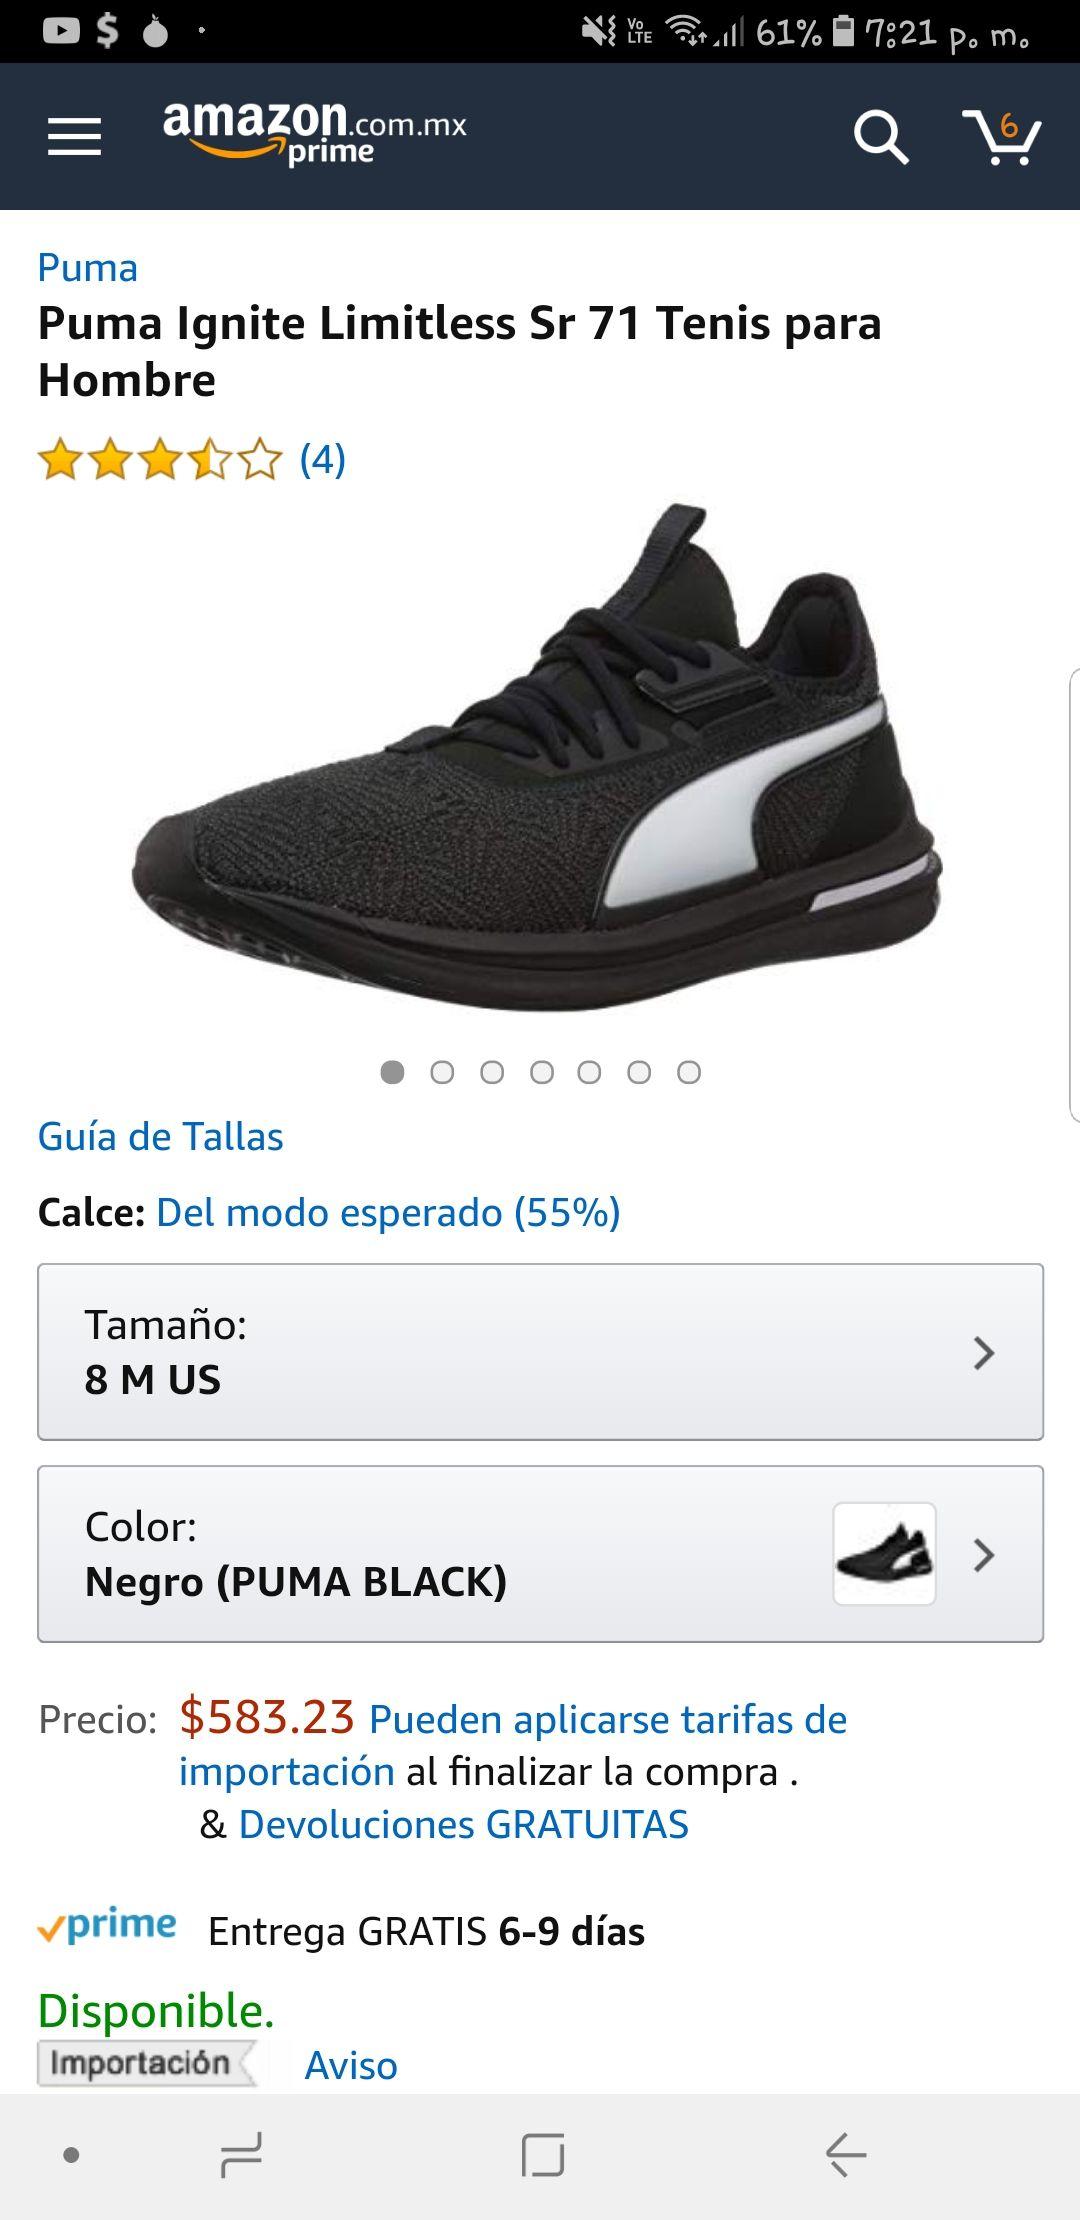 Amazon: Tenis Puma  Ignite Limitless Sr 71 Tenis para  Hombre # 6